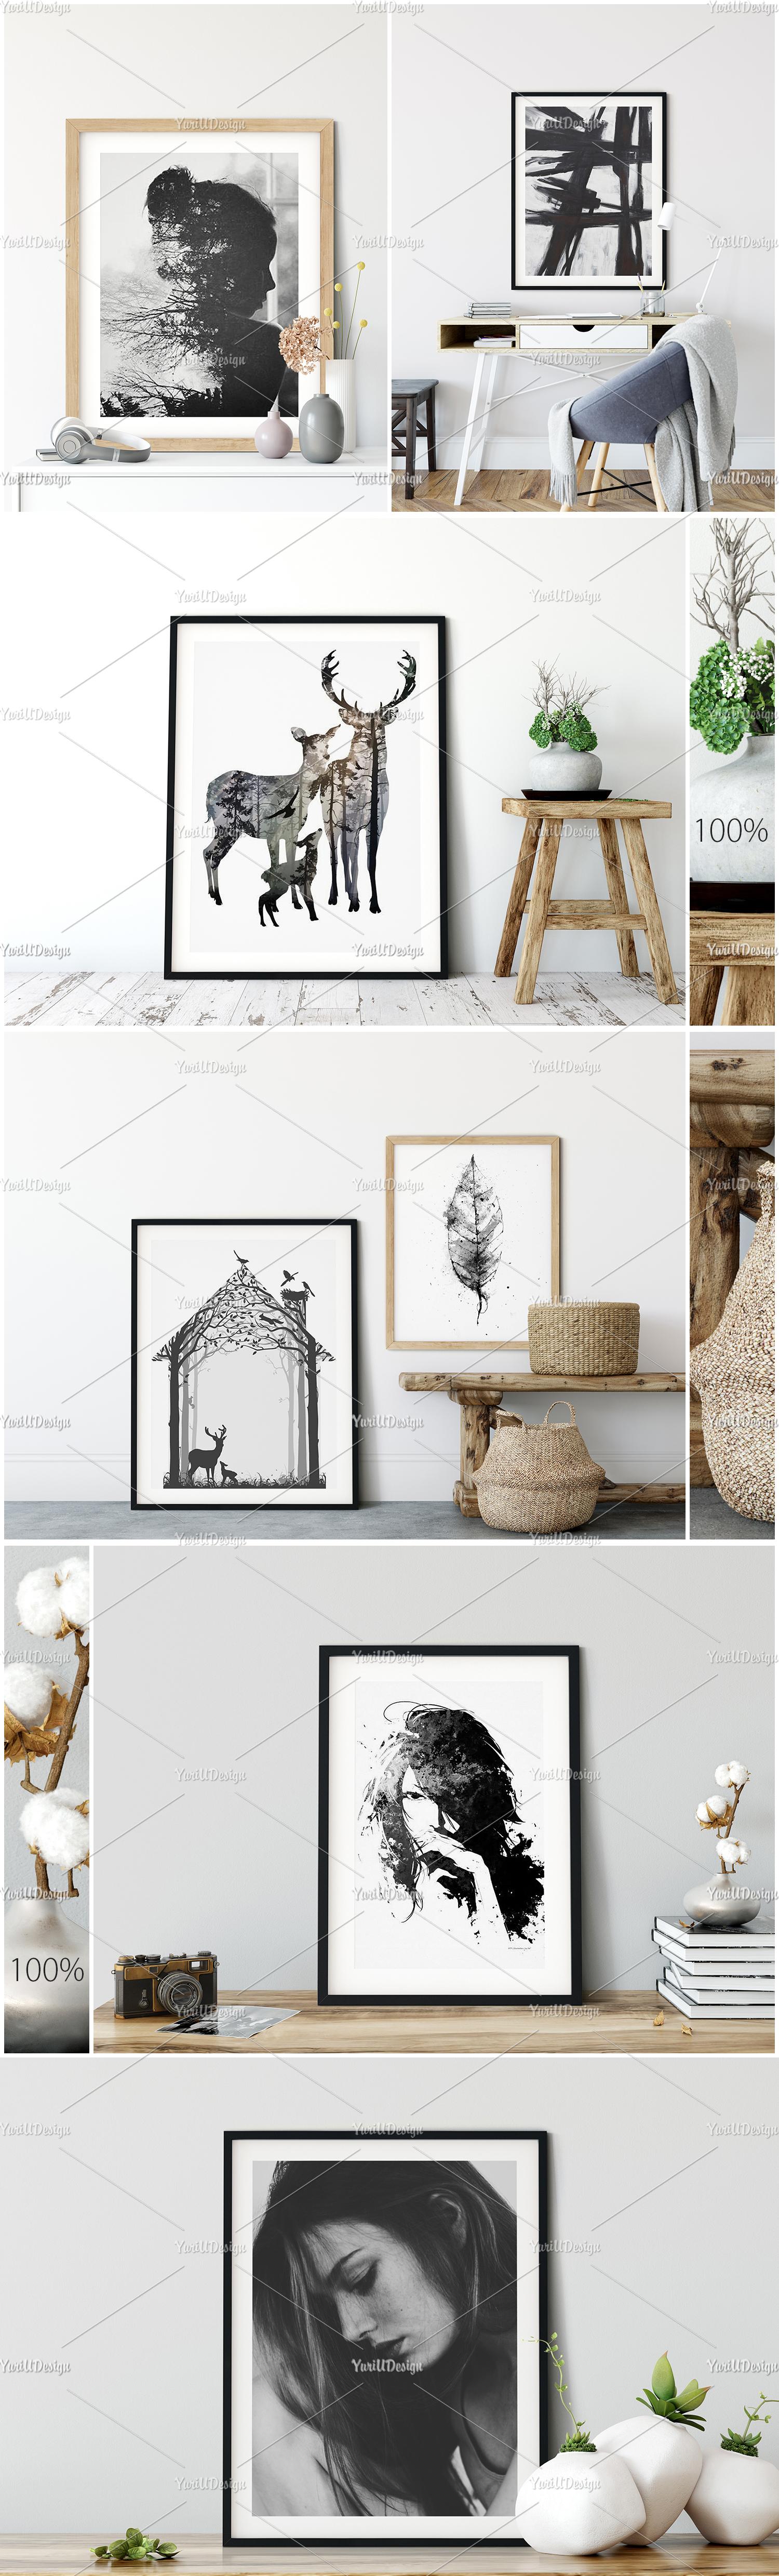 Scandinavian Interior Frames & Walls Mockup Bundle example image 7